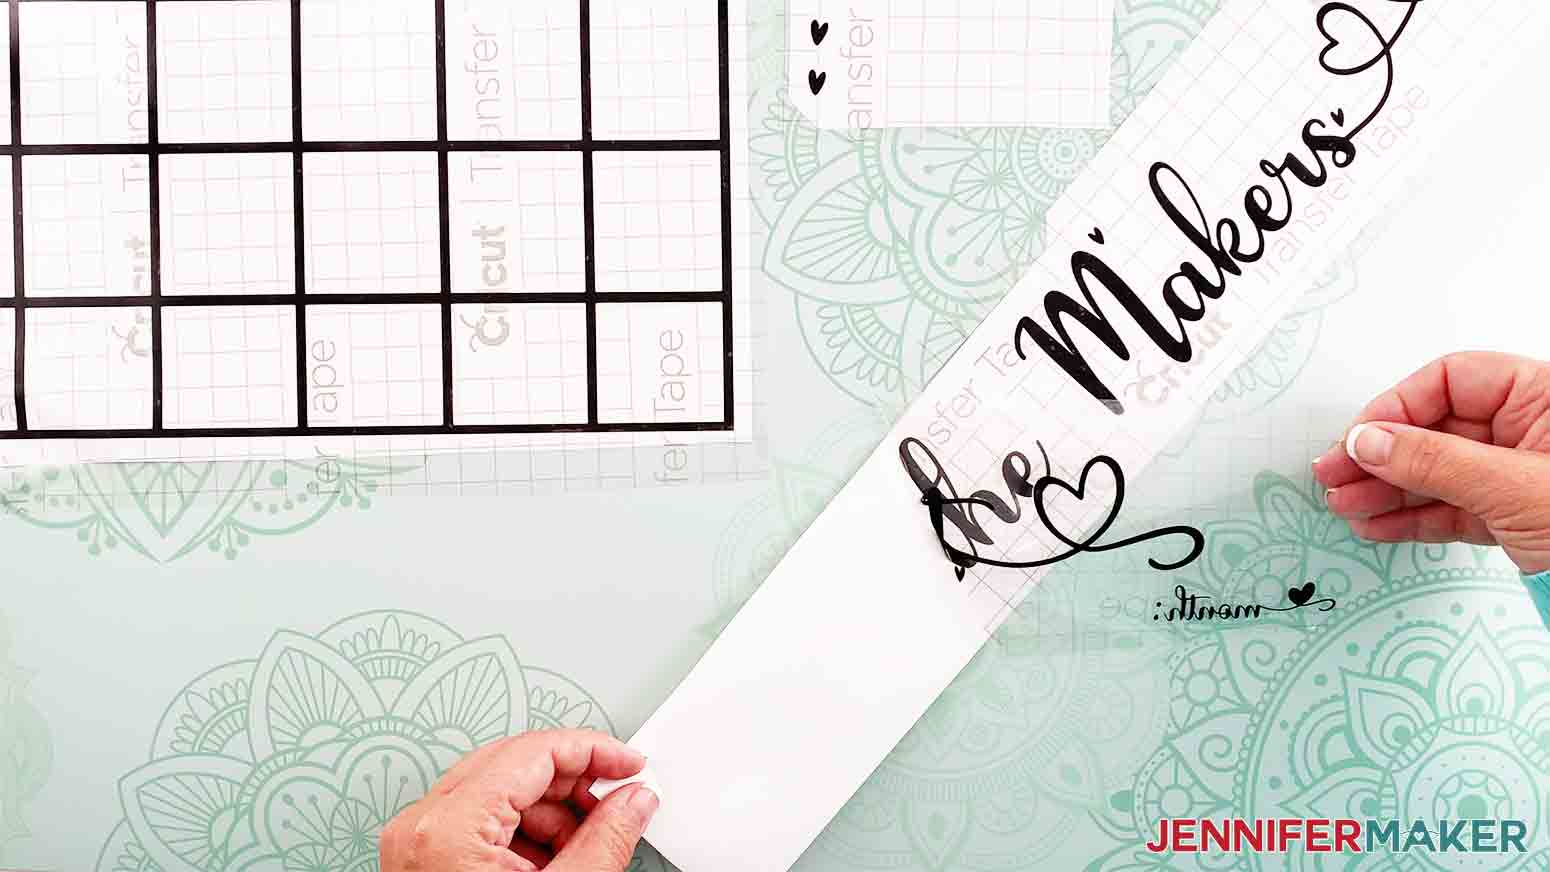 DIY-Whiteboard-Calendar-JenniferMaker-remove-transfer-tape